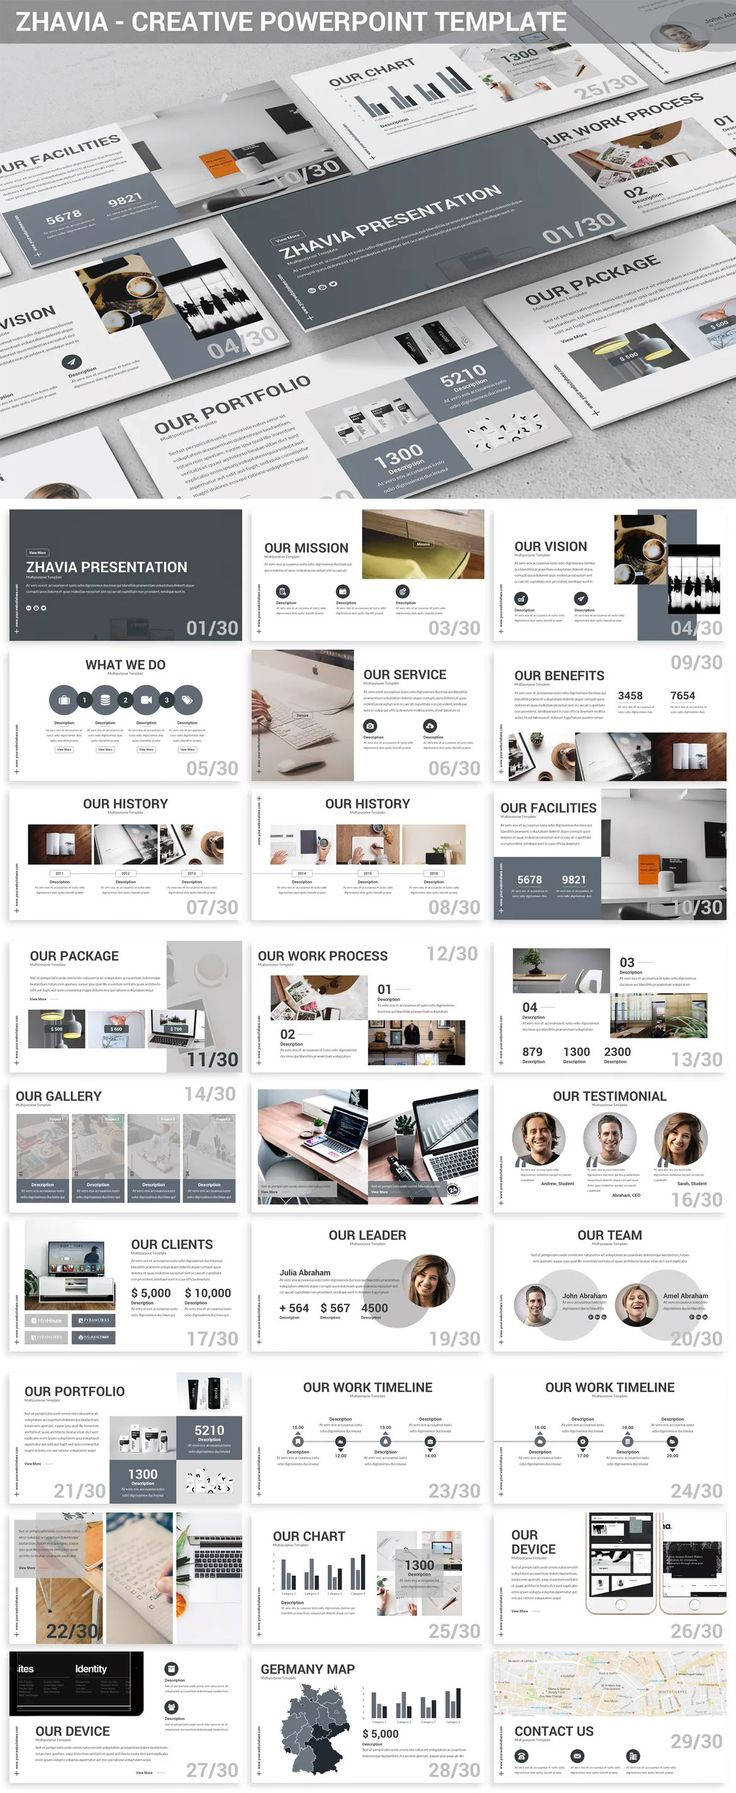 Zhavia - Creative Powerpoint Presentation Template